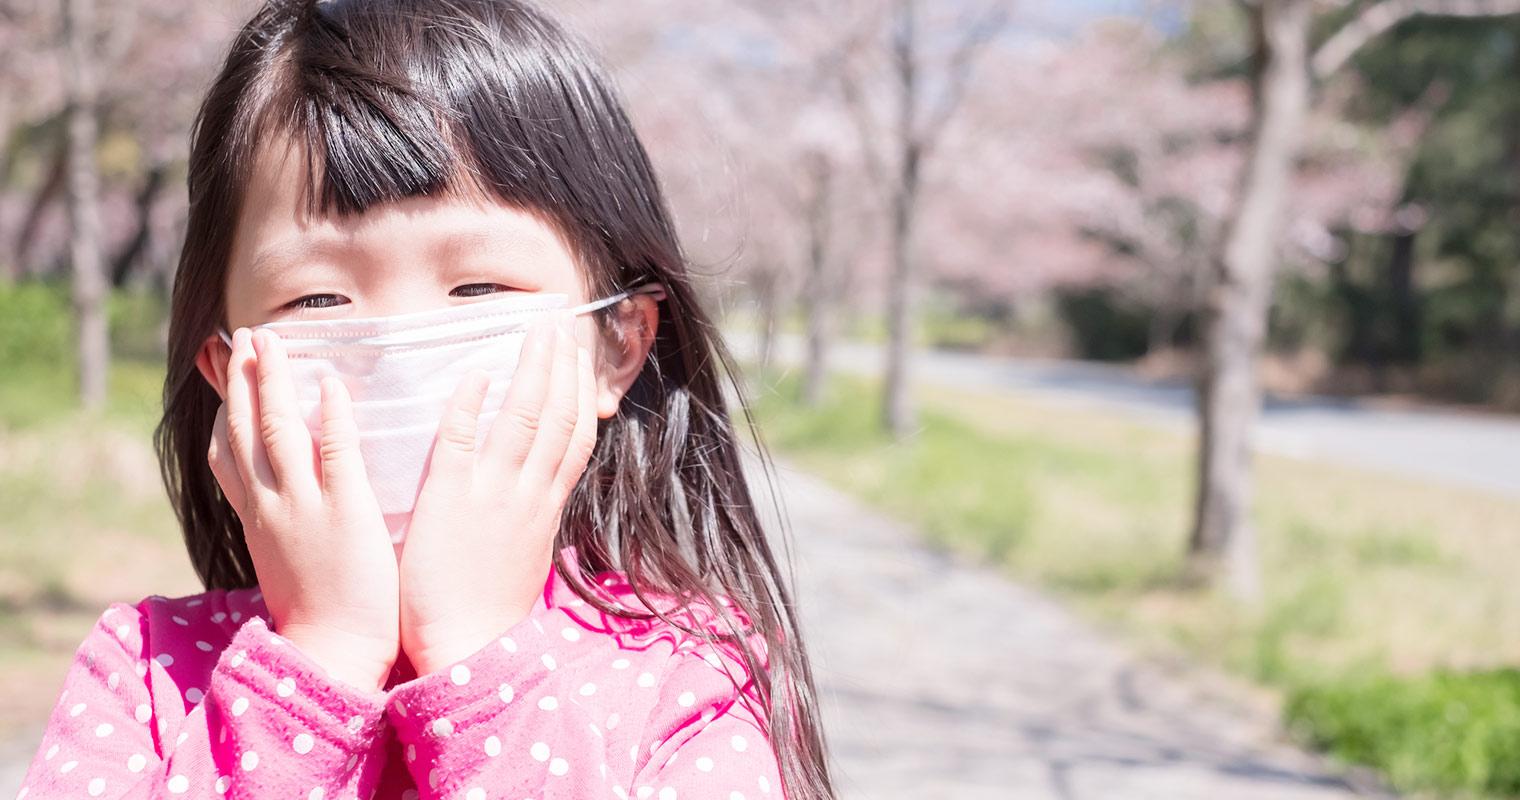 Children Travel Ailments – Prevention & Quick Fixes